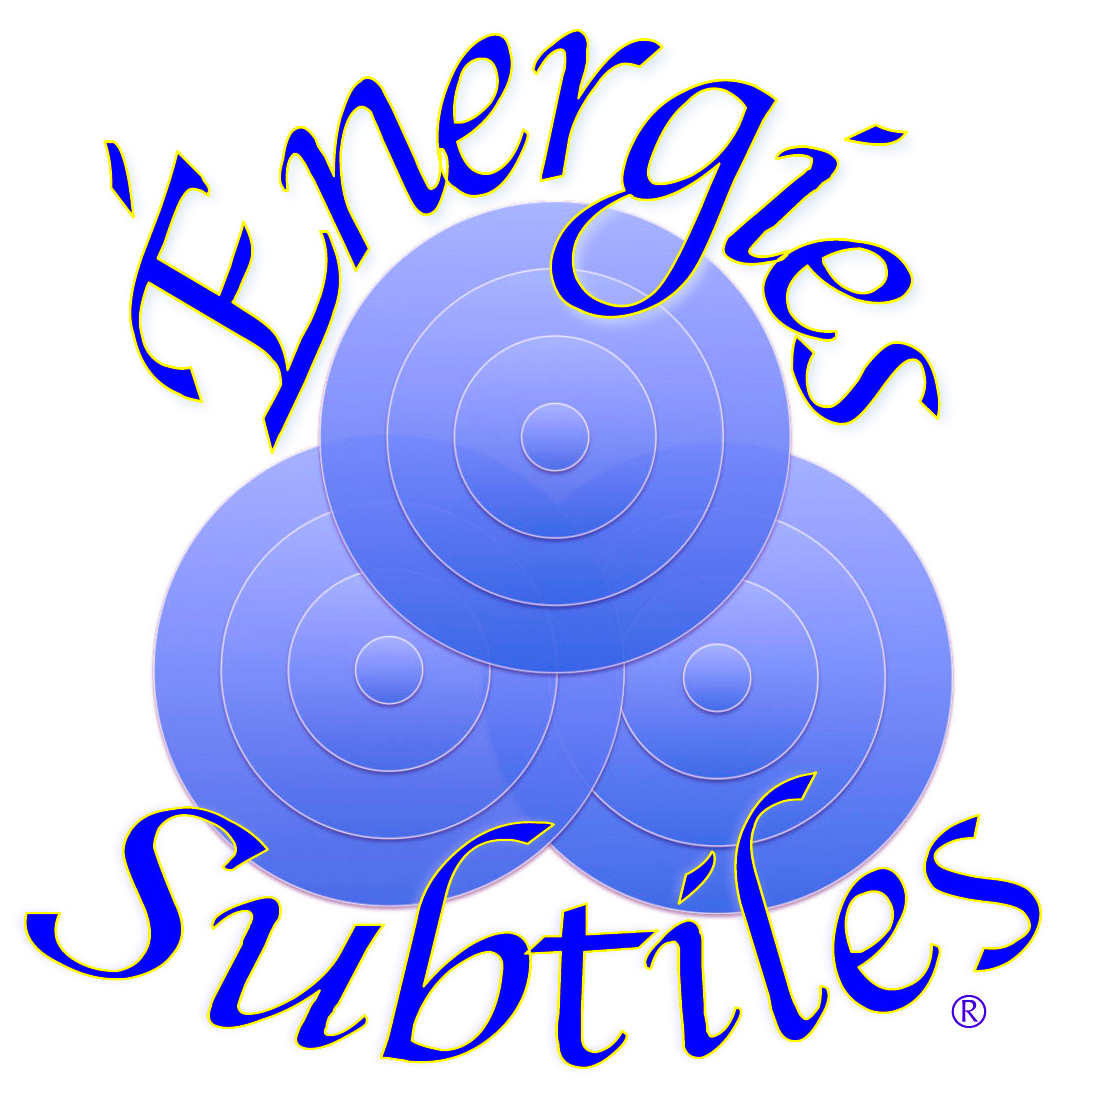 Energies subtiles ®